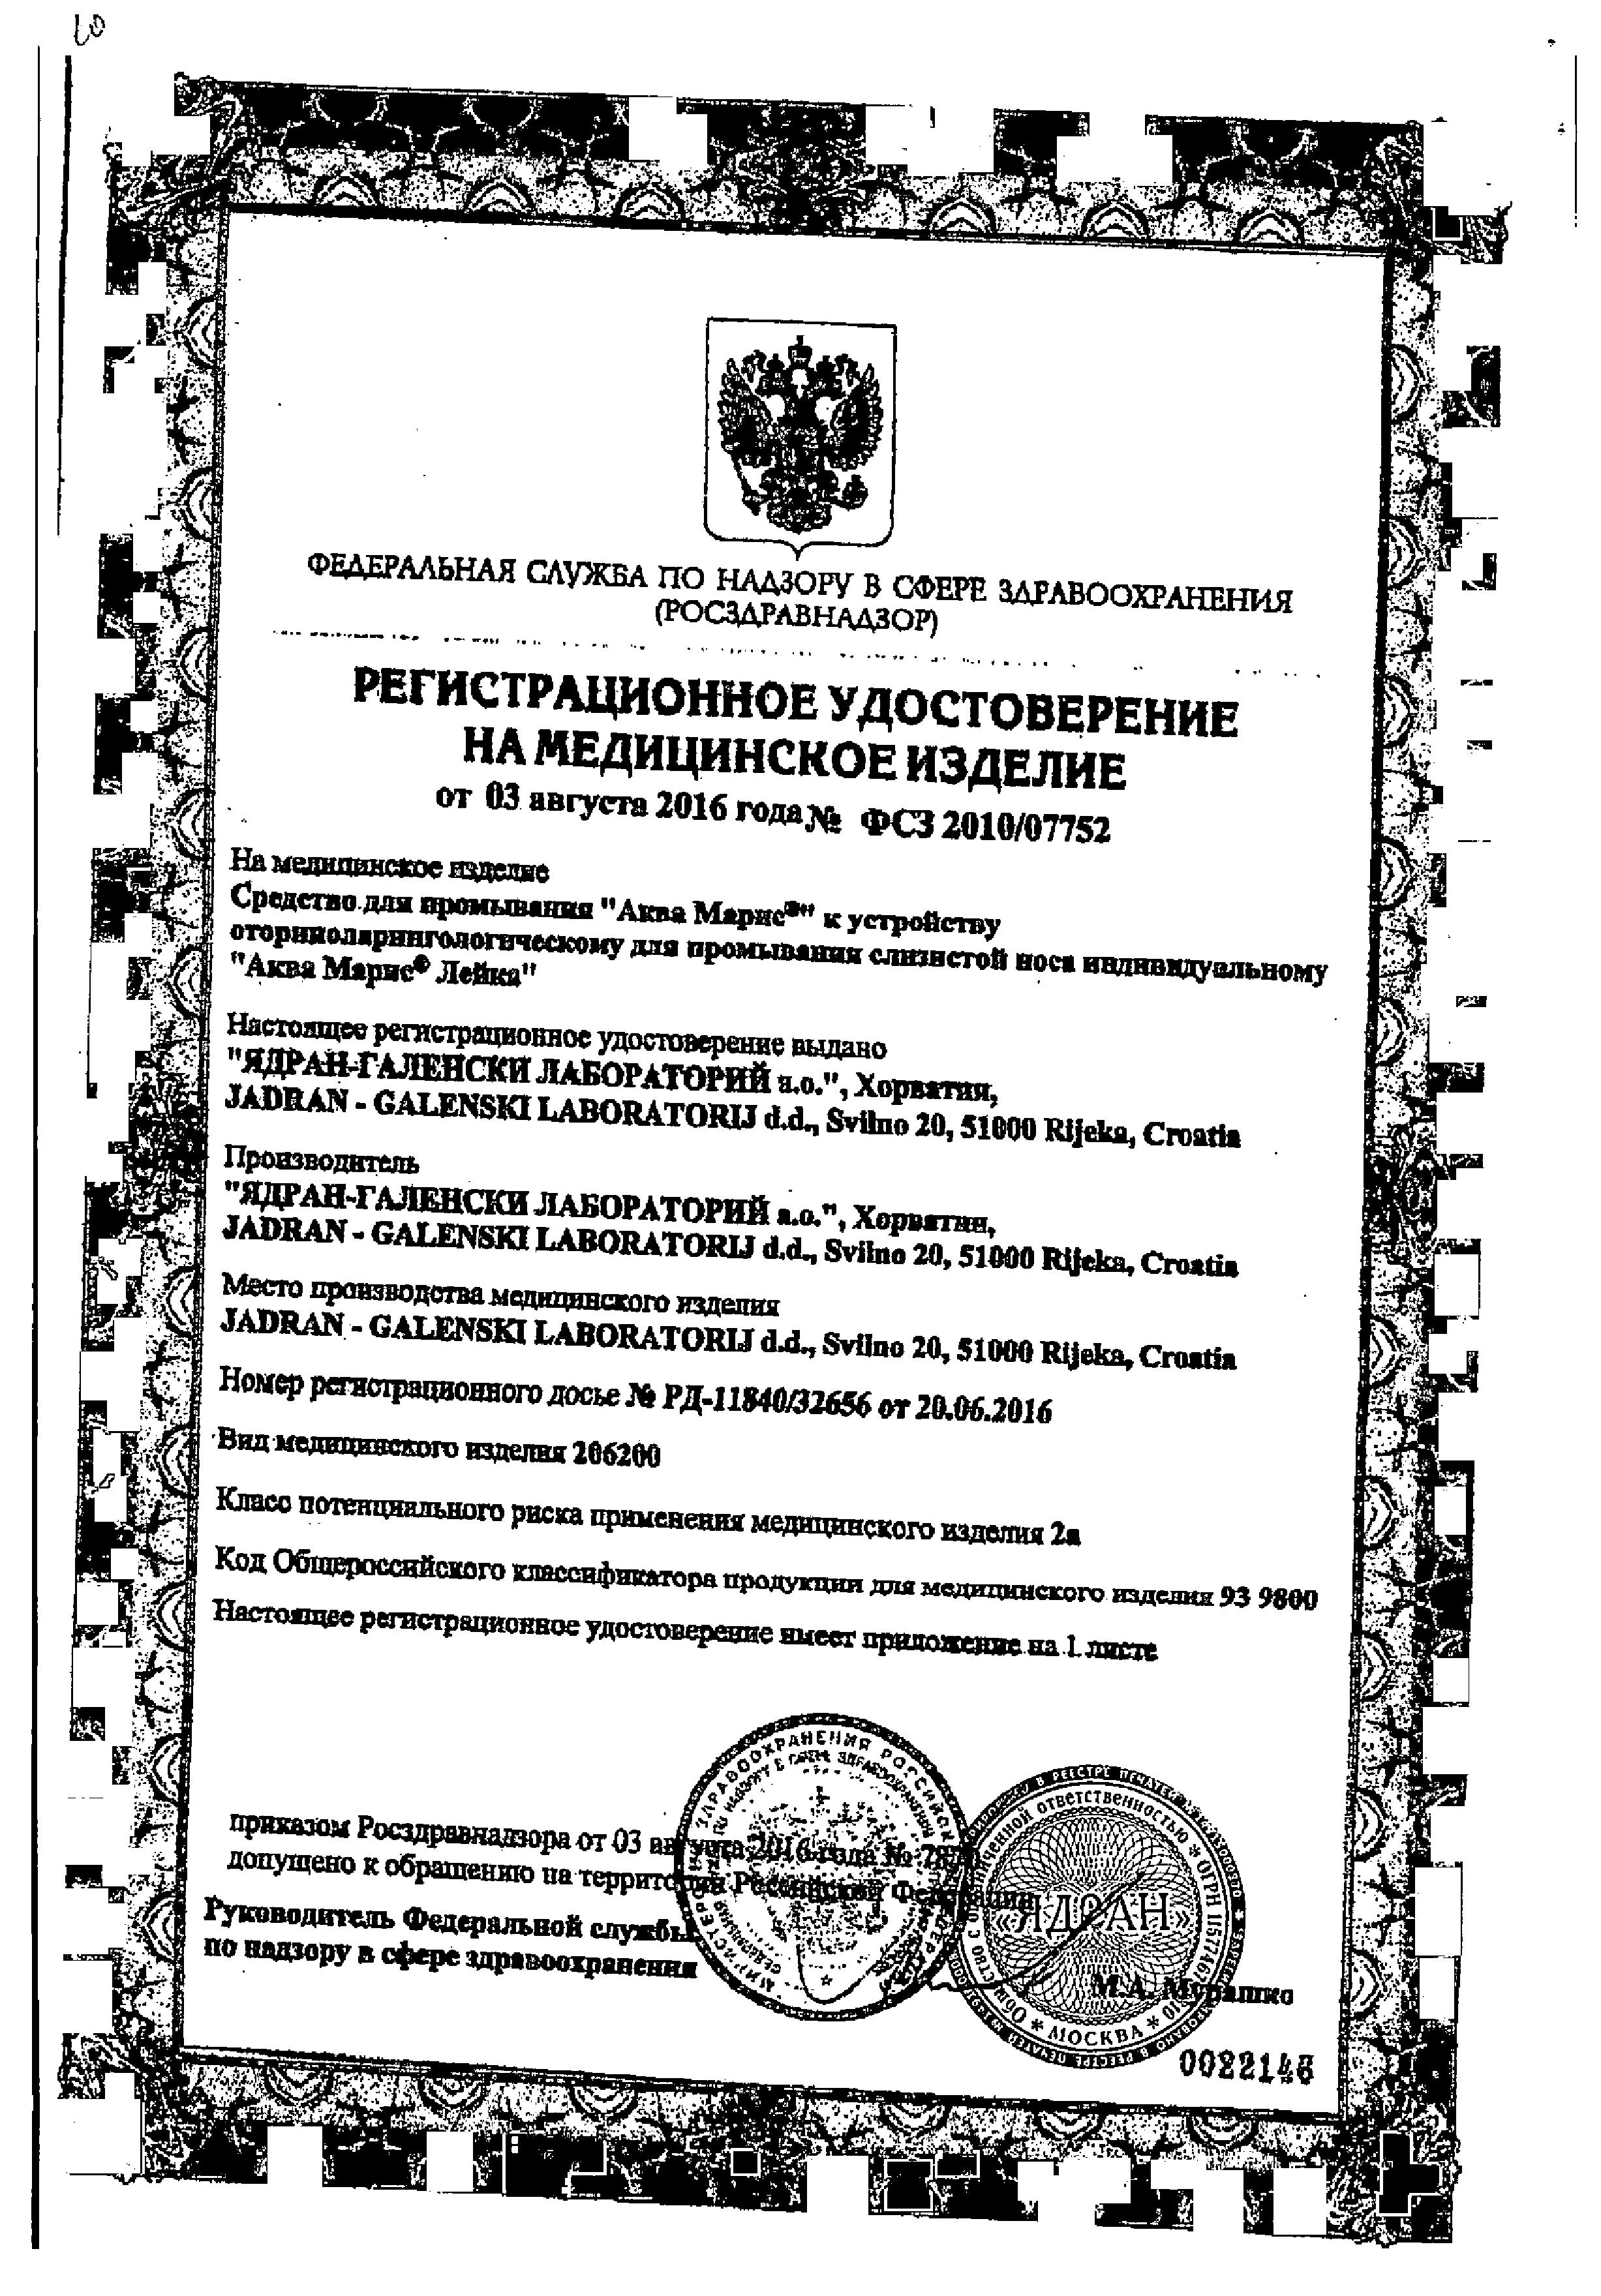 Аква Марис Лейка устройство и средство для промывания носа саше N30 сертификат